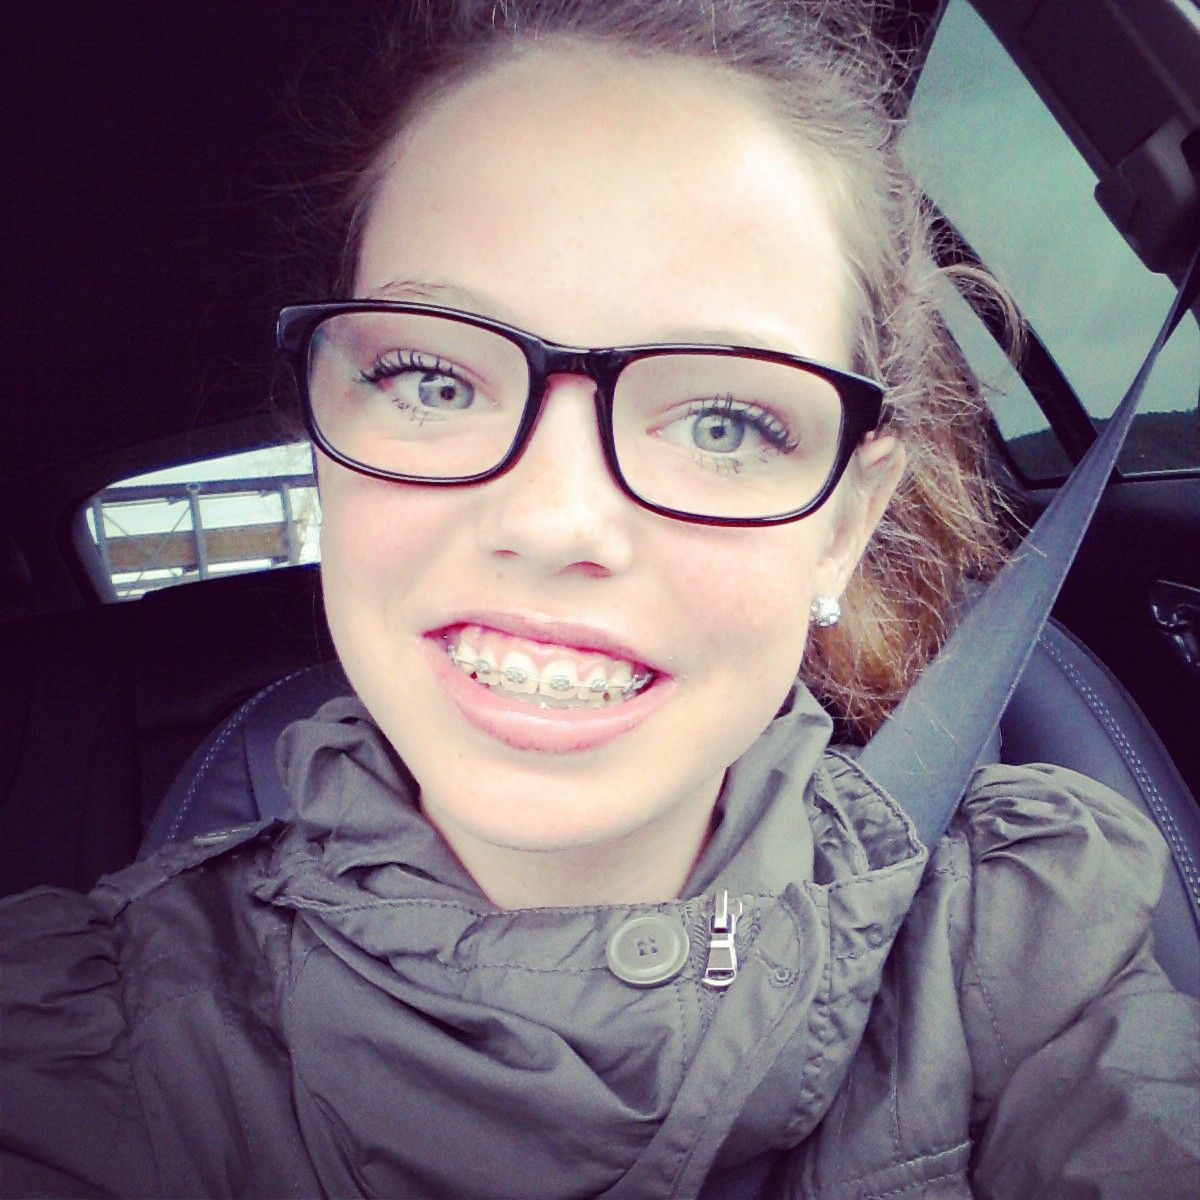 Braces And Glasses Tumblr